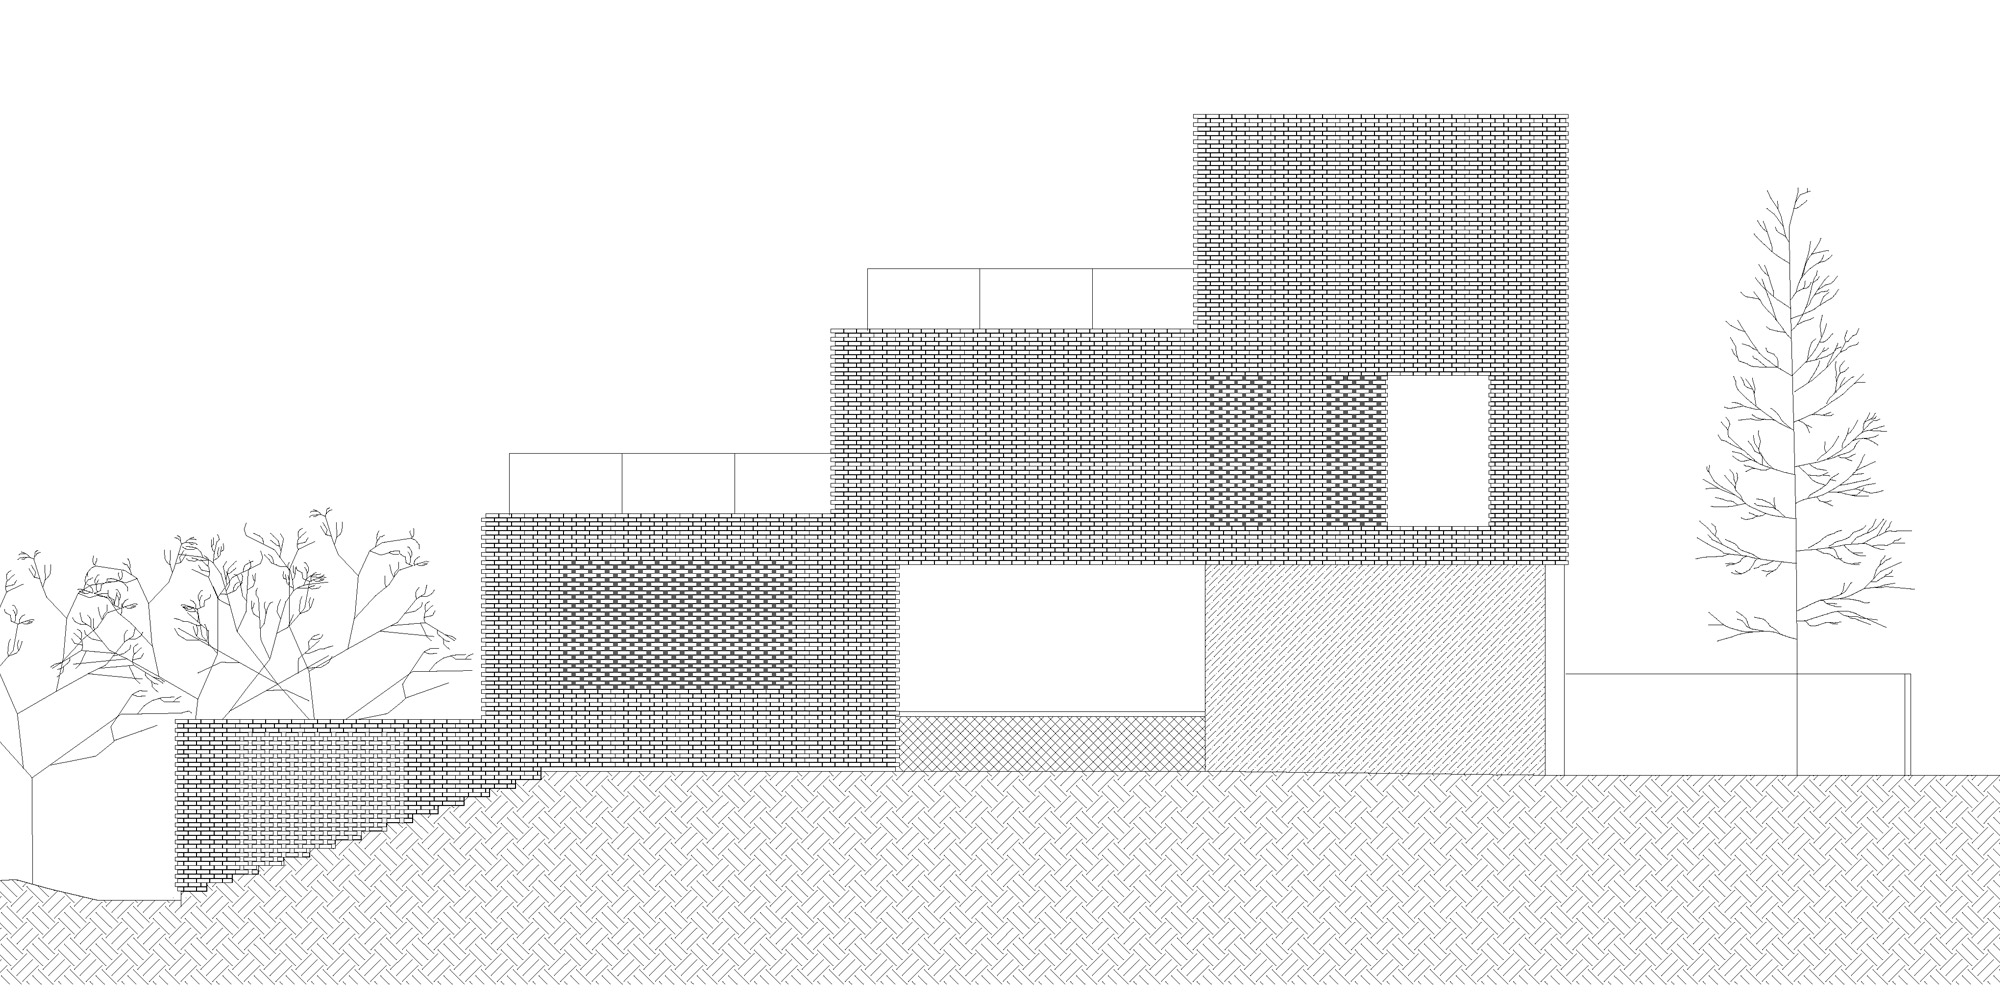 South elevation © OFIS architekti